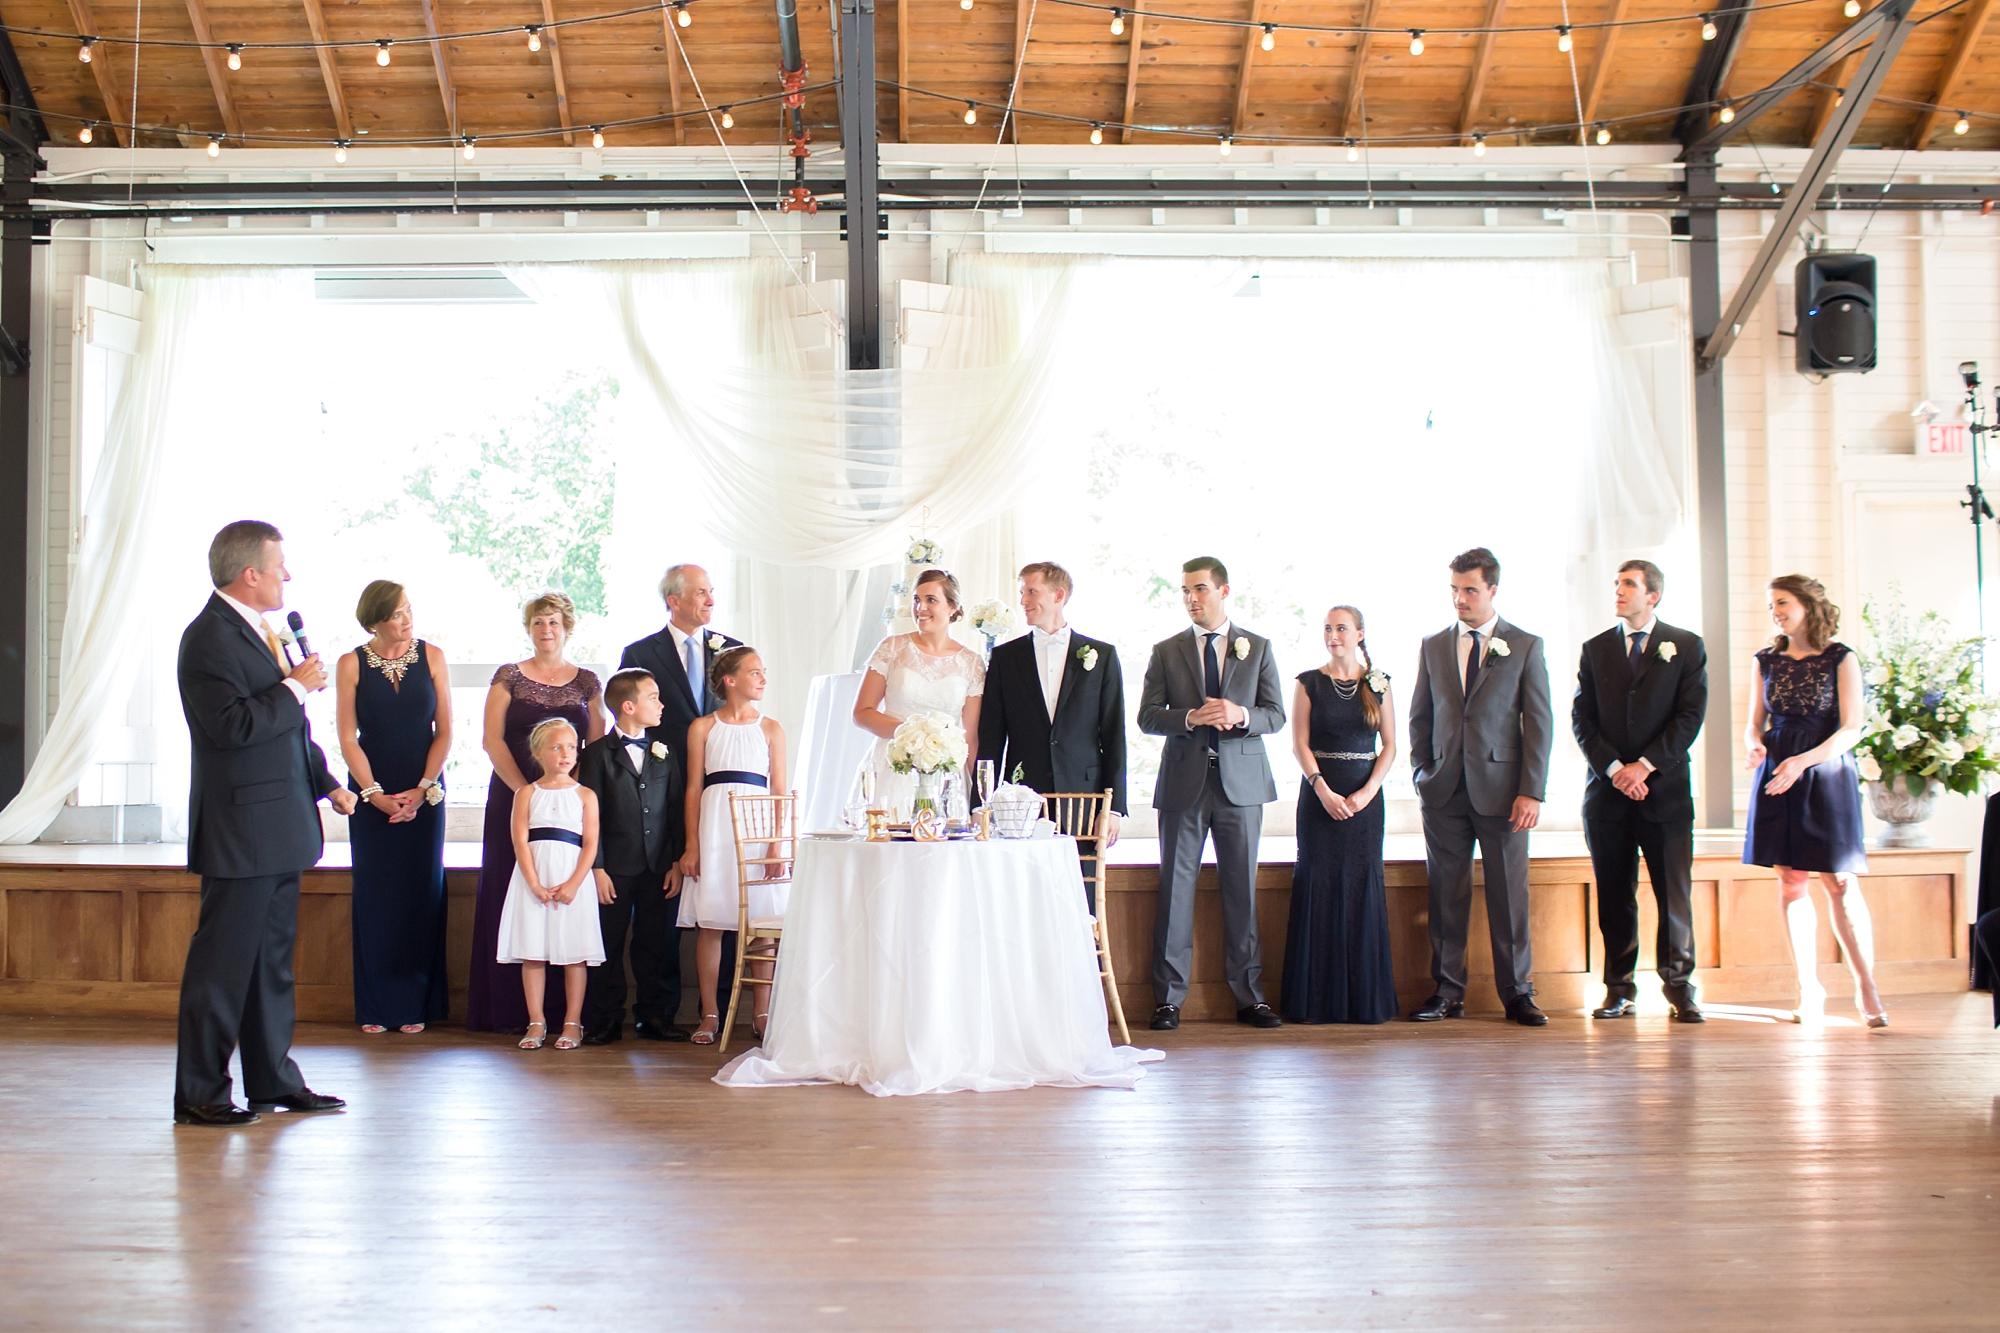 Somerville 6-Reception-192_anna grace photography sherwood forest annapolis maryland wedding photographer photo.jpg